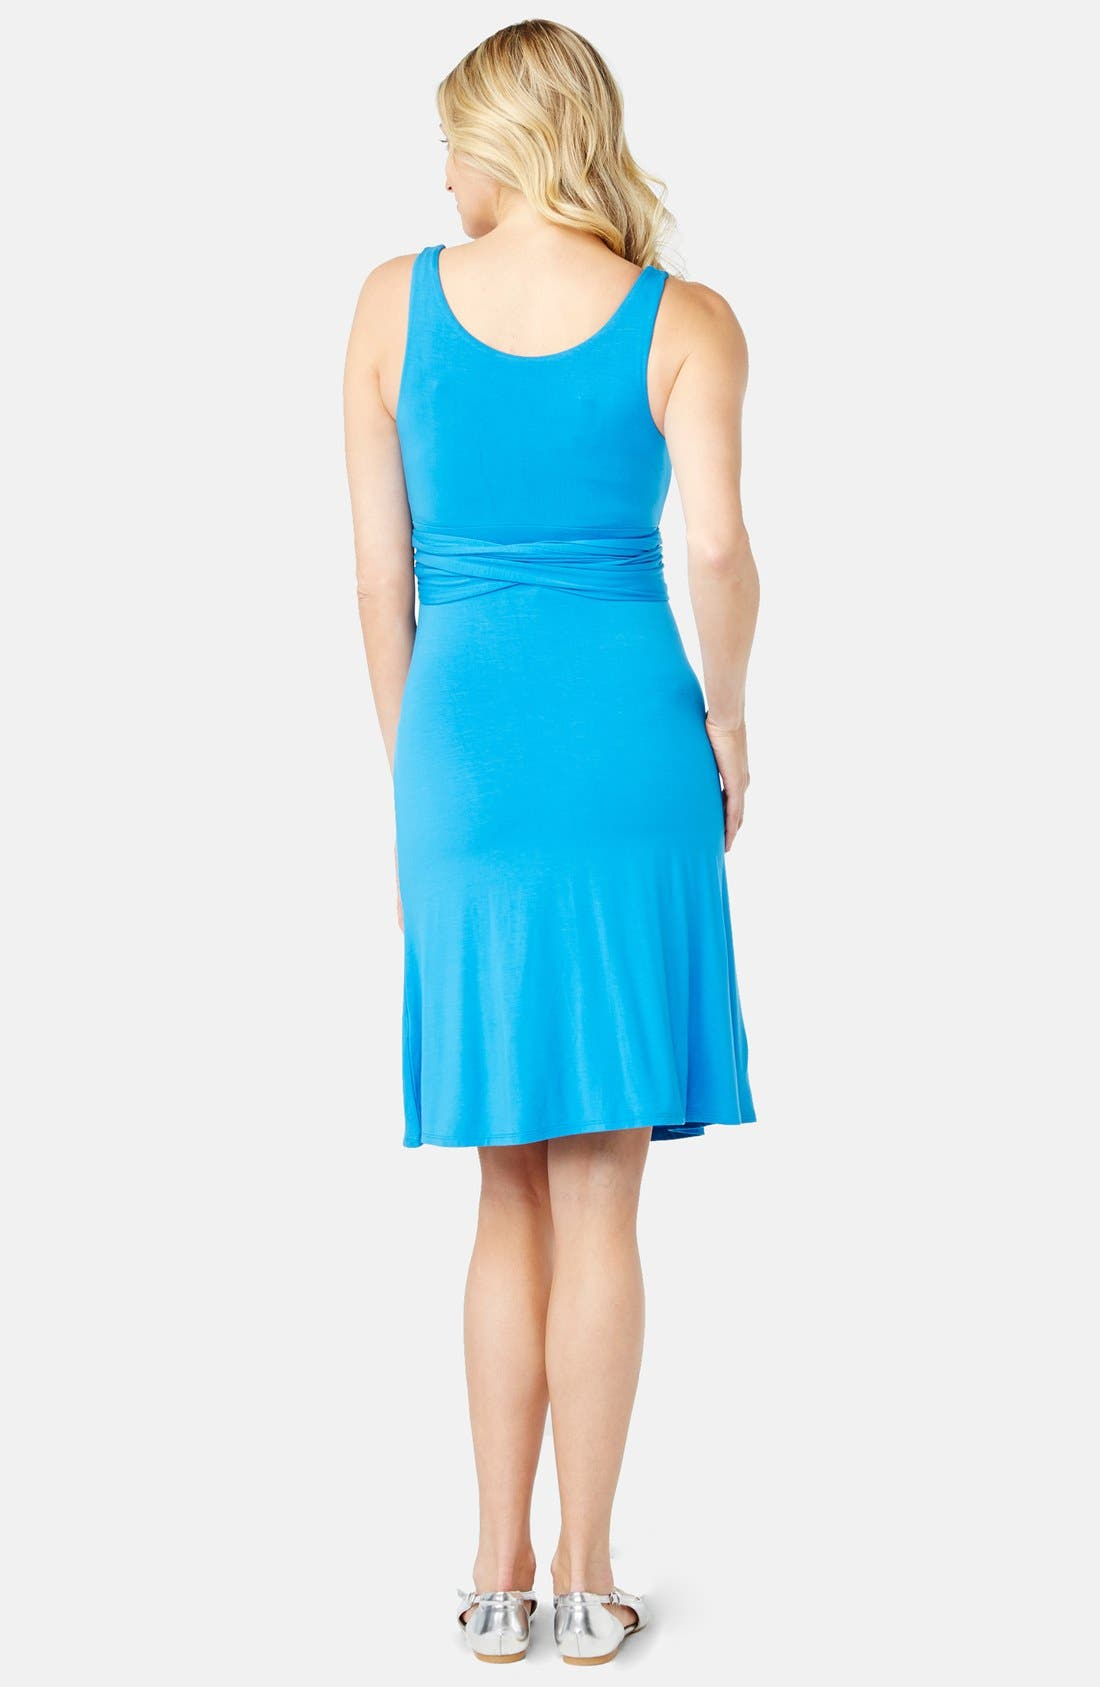 'Best' Maternity Dress,                             Alternate thumbnail 2, color,                             430